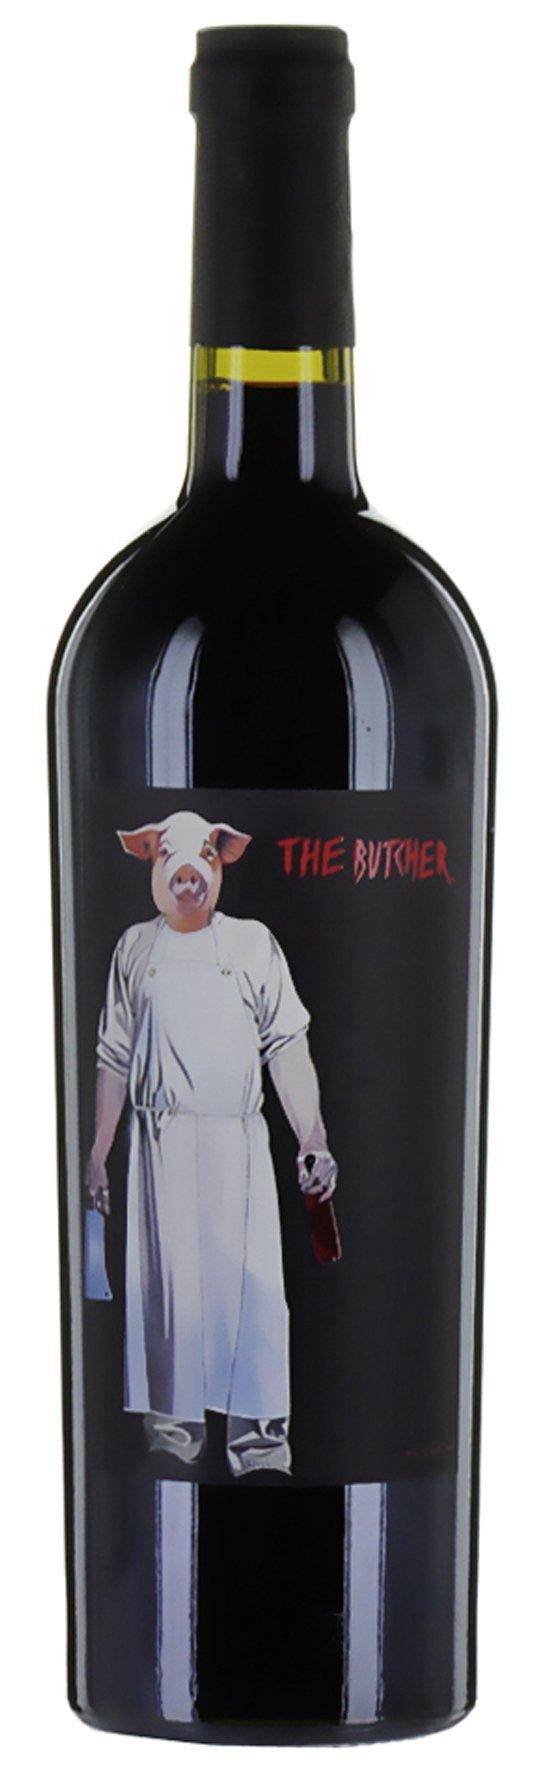 Weingut-Schwarz-The-Butcher-Cuve-2016-Rot-6-x-075l